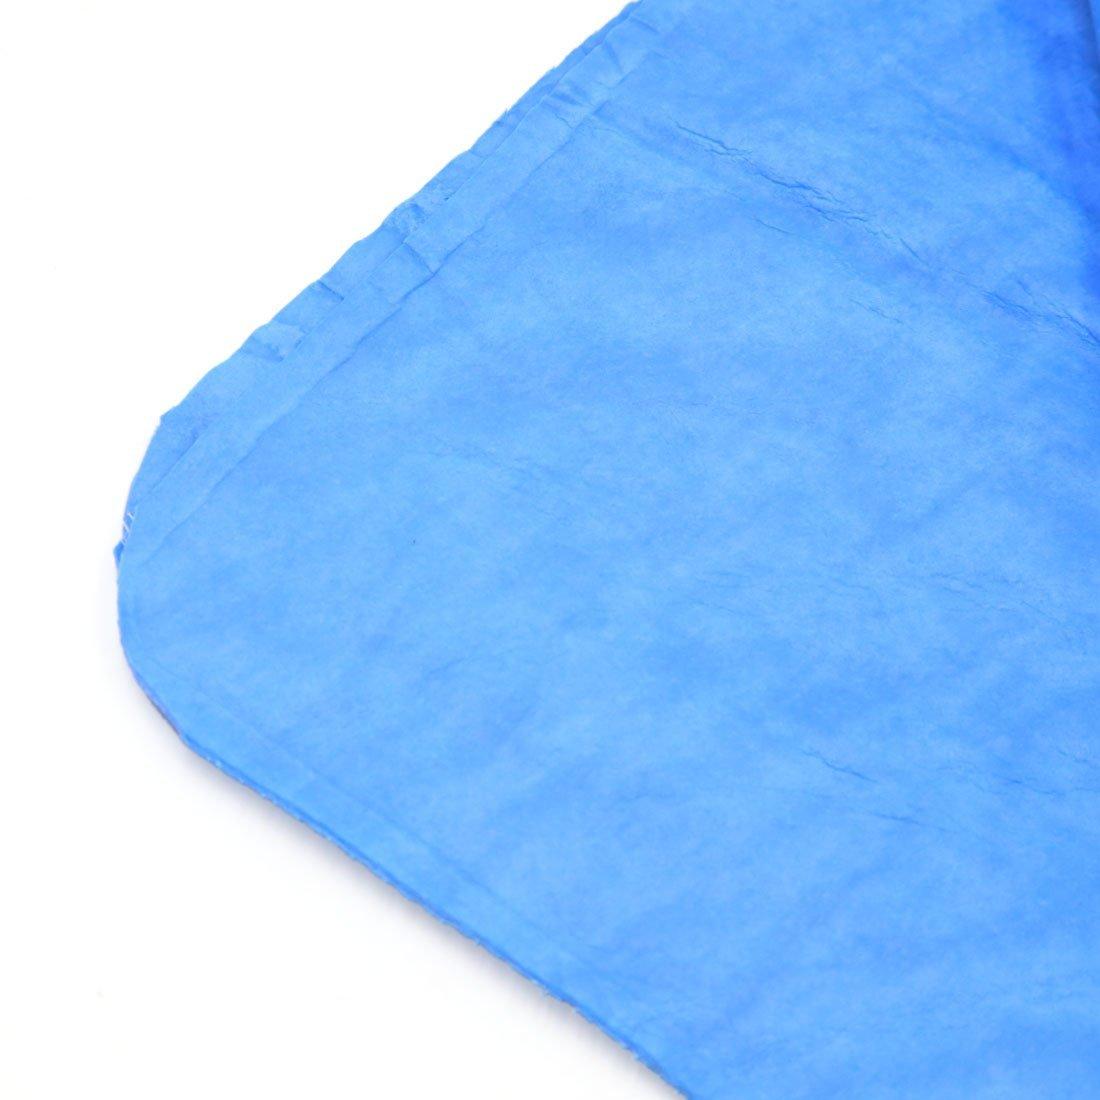 Amazon.com: eDealMax Azul sintético Gamuza auto del coche de Cristal de Agua Limpia Parabrisas Absorbe Toalla: Automotive